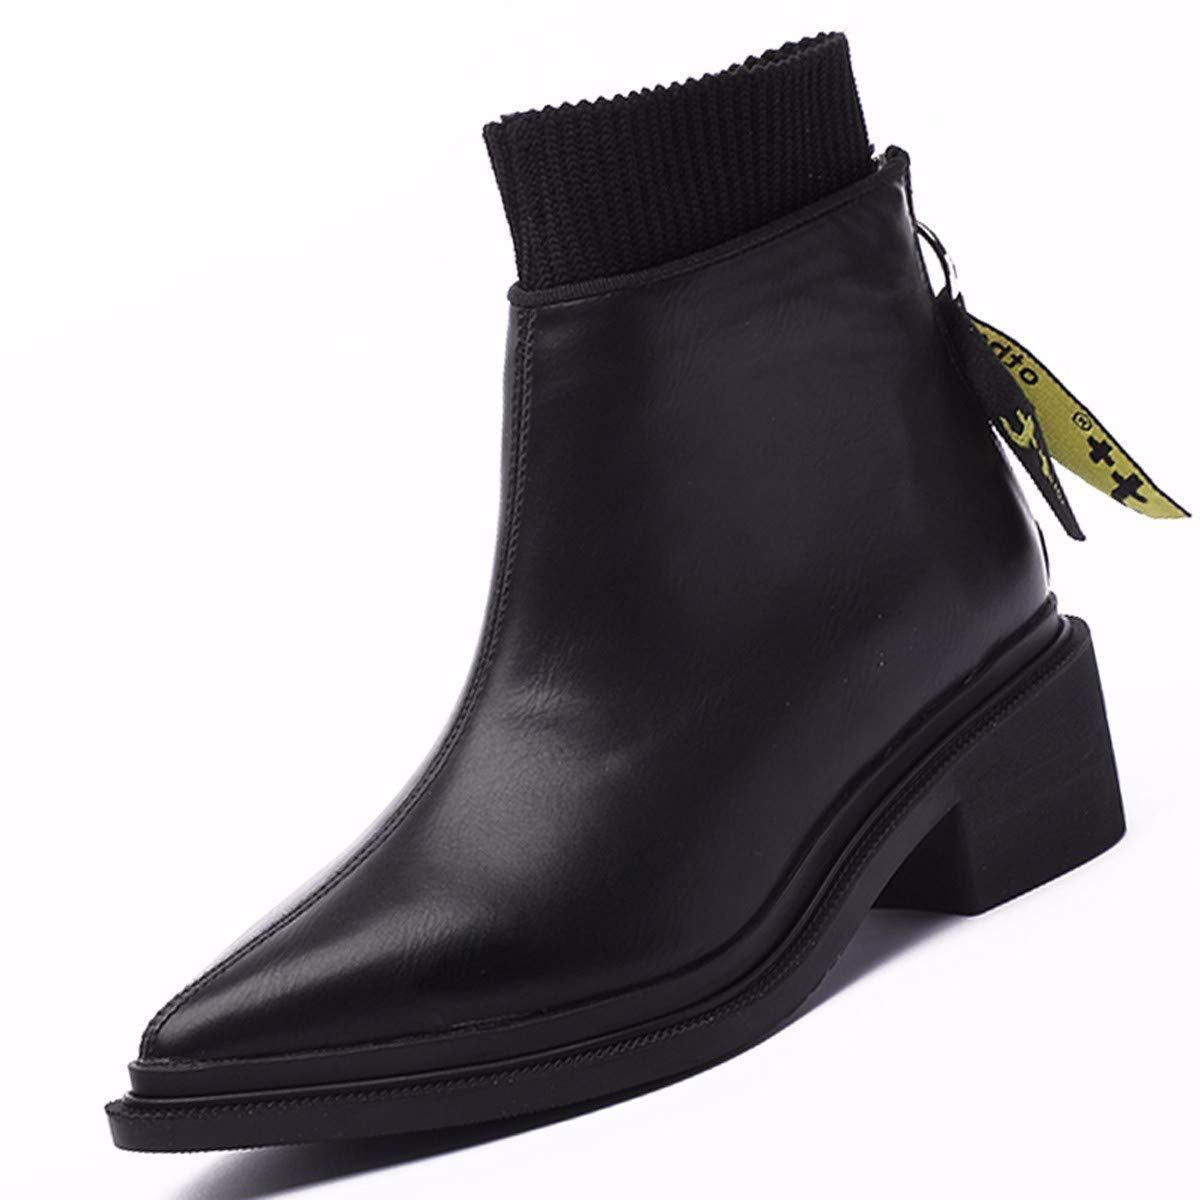 KPHY Damenschuhe Mode Martin Stiefel 5Cm Heel Runden Kopf Kopf Kopf Stiefel Reißverschluss Dicke Sohle Einzigen Schuh 432bb6